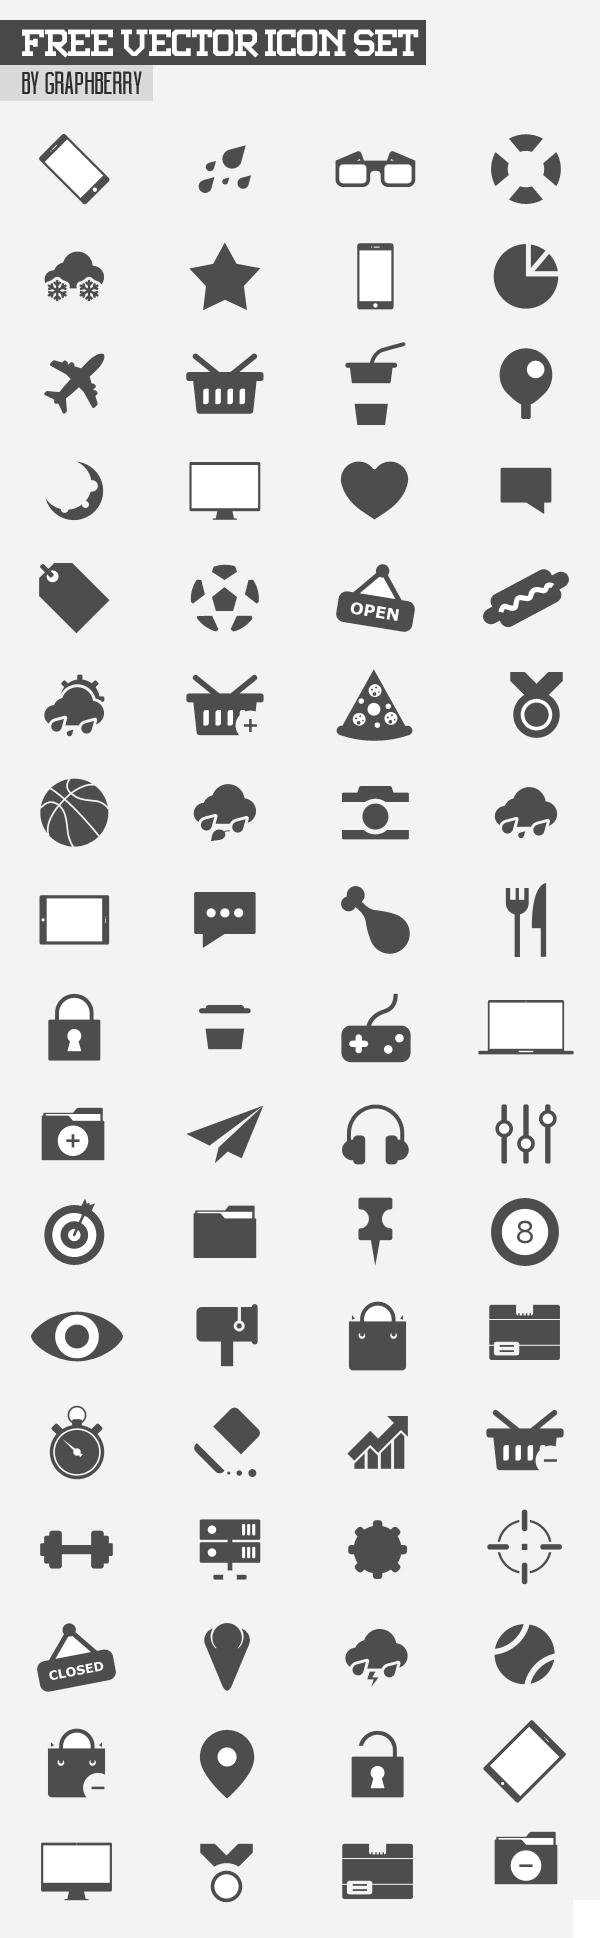 Free Vector Icon Set - 80+ Icons